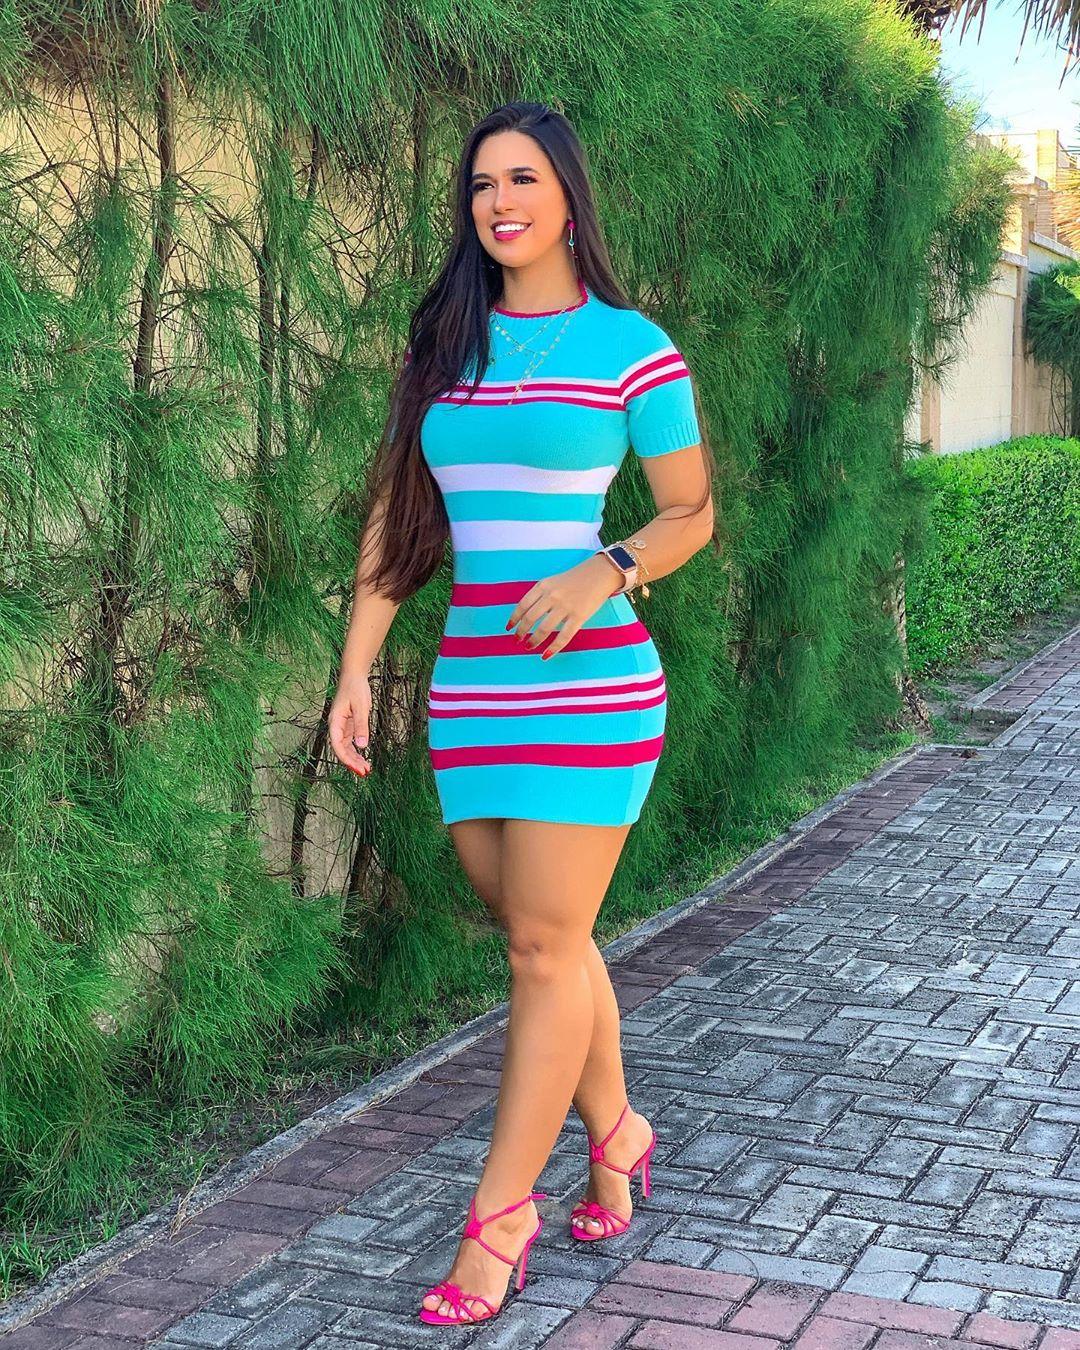 Amanda-Gomes-Wallpapers-Insta-Fit-Bio-1